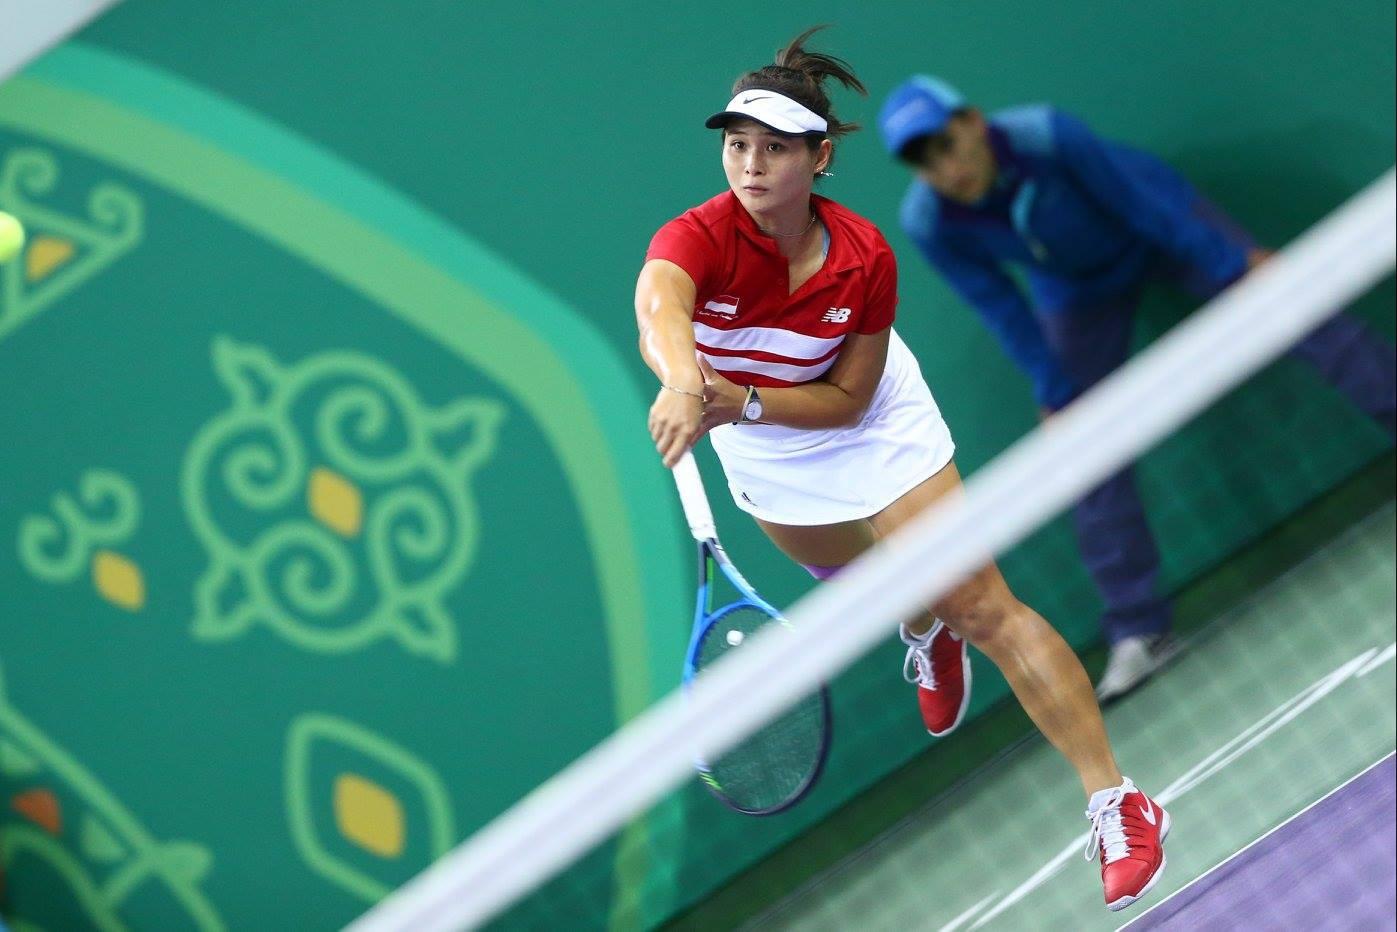 Indonesia's Beatrice Gumulya beat compatriot Aldila Sutjiadi in the women's singles indoor tennis final ©Ashgabat 2017/Facebook